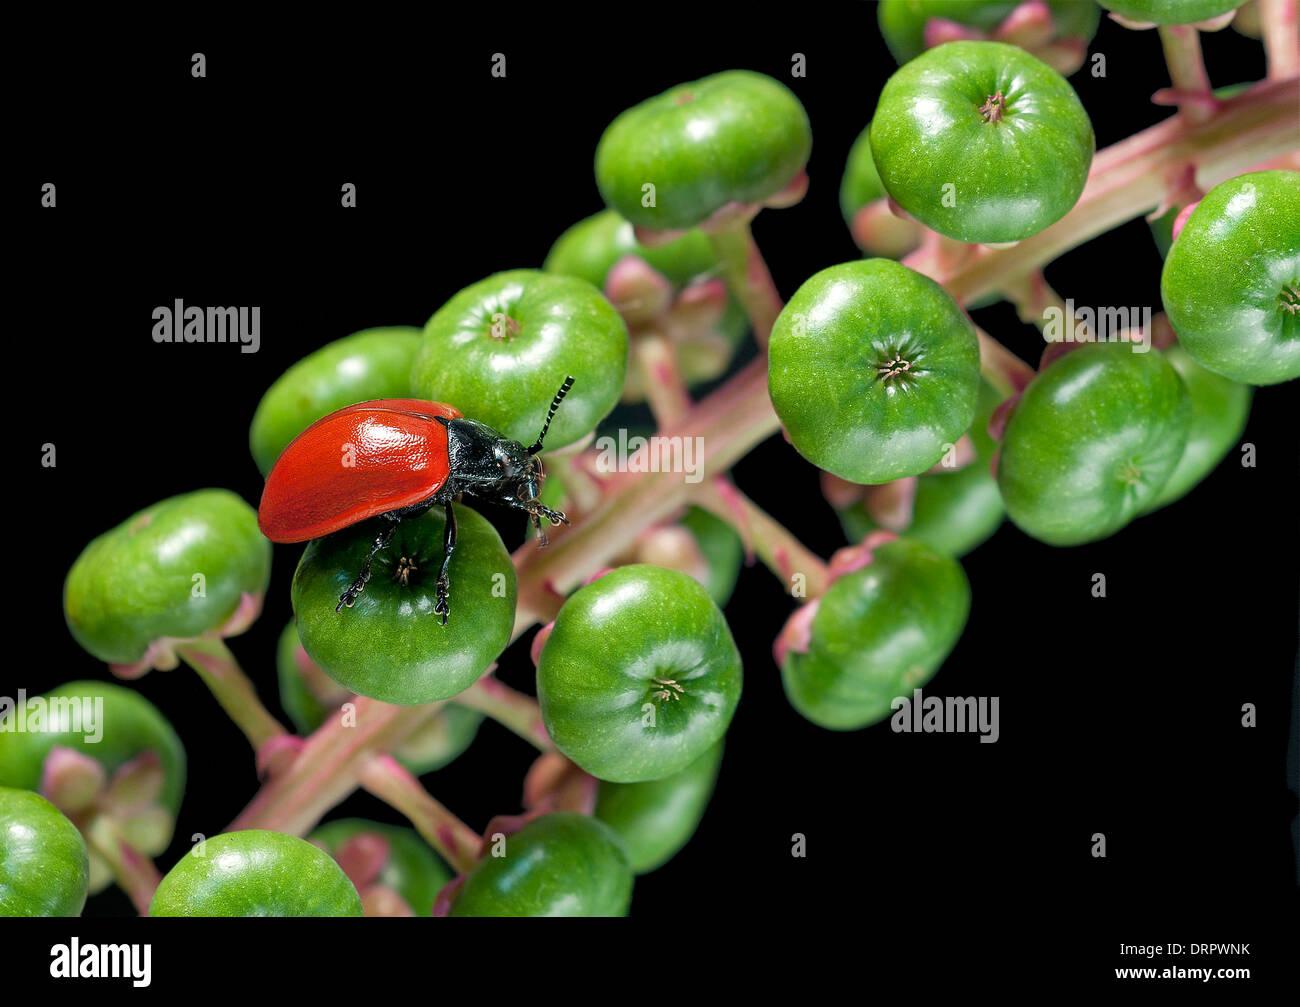 Melasoma populi on berries of Phitolacca - Stock Image